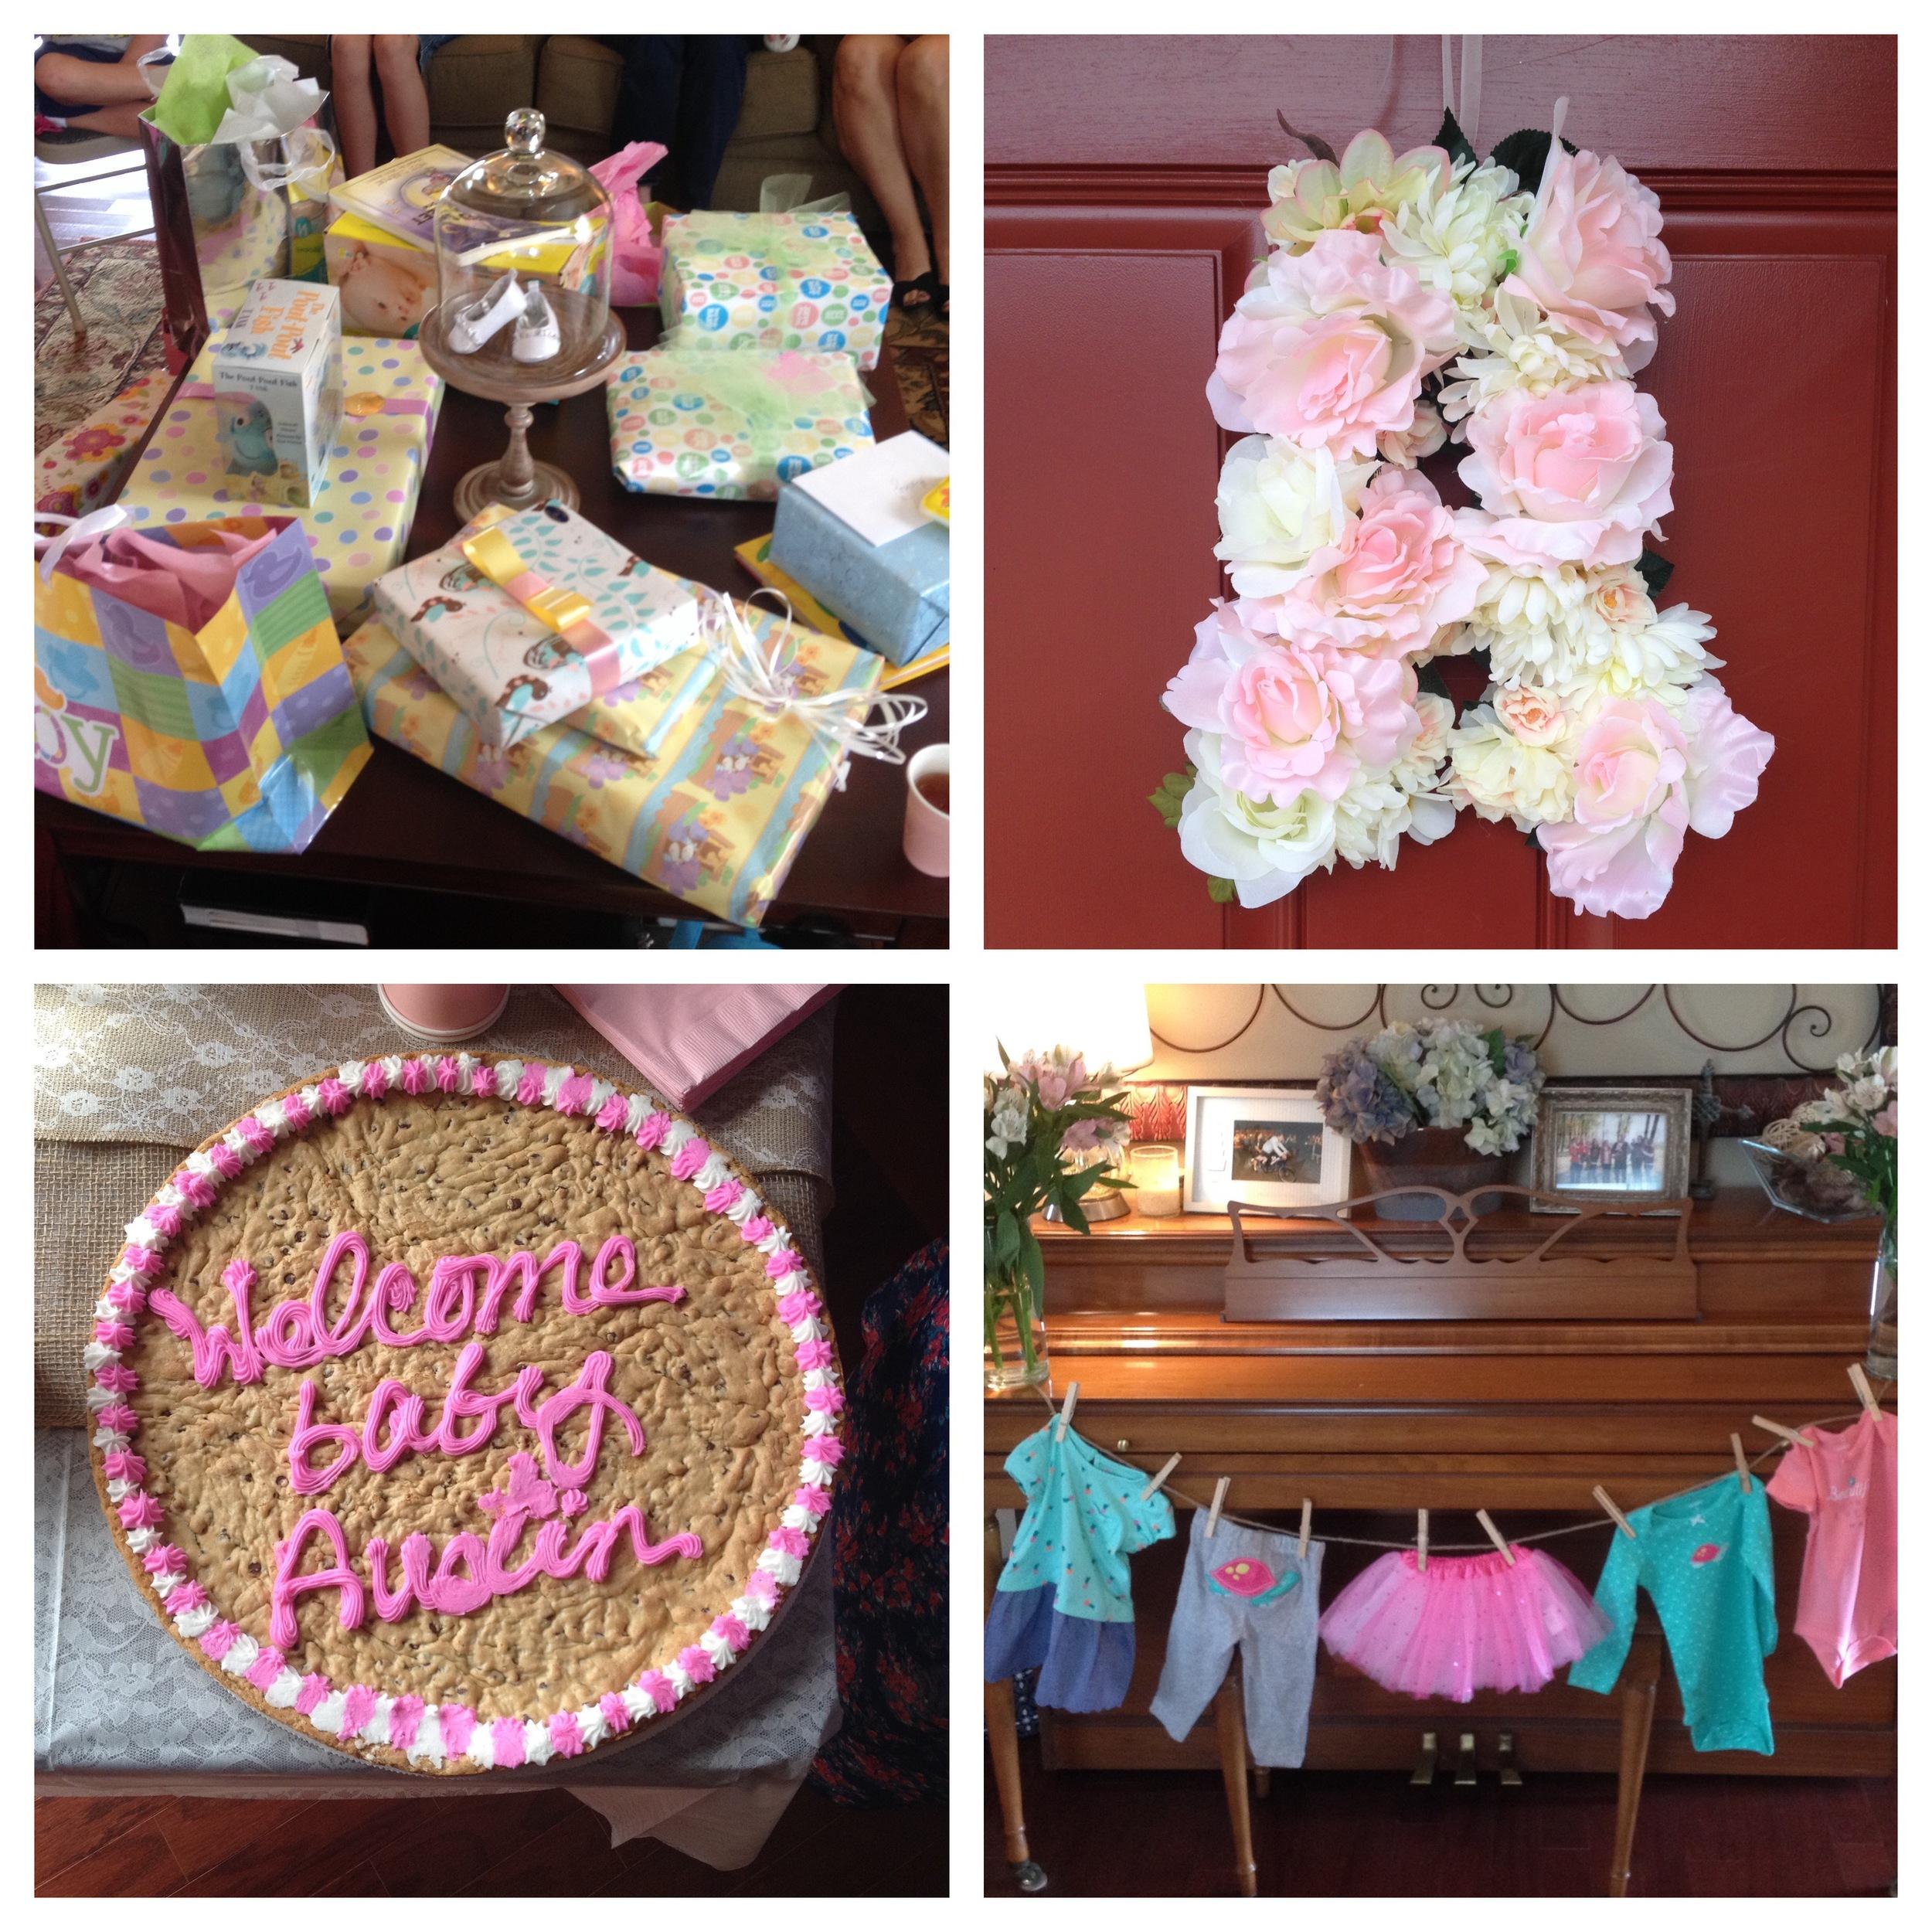 Austin's baby shower in Greenville!